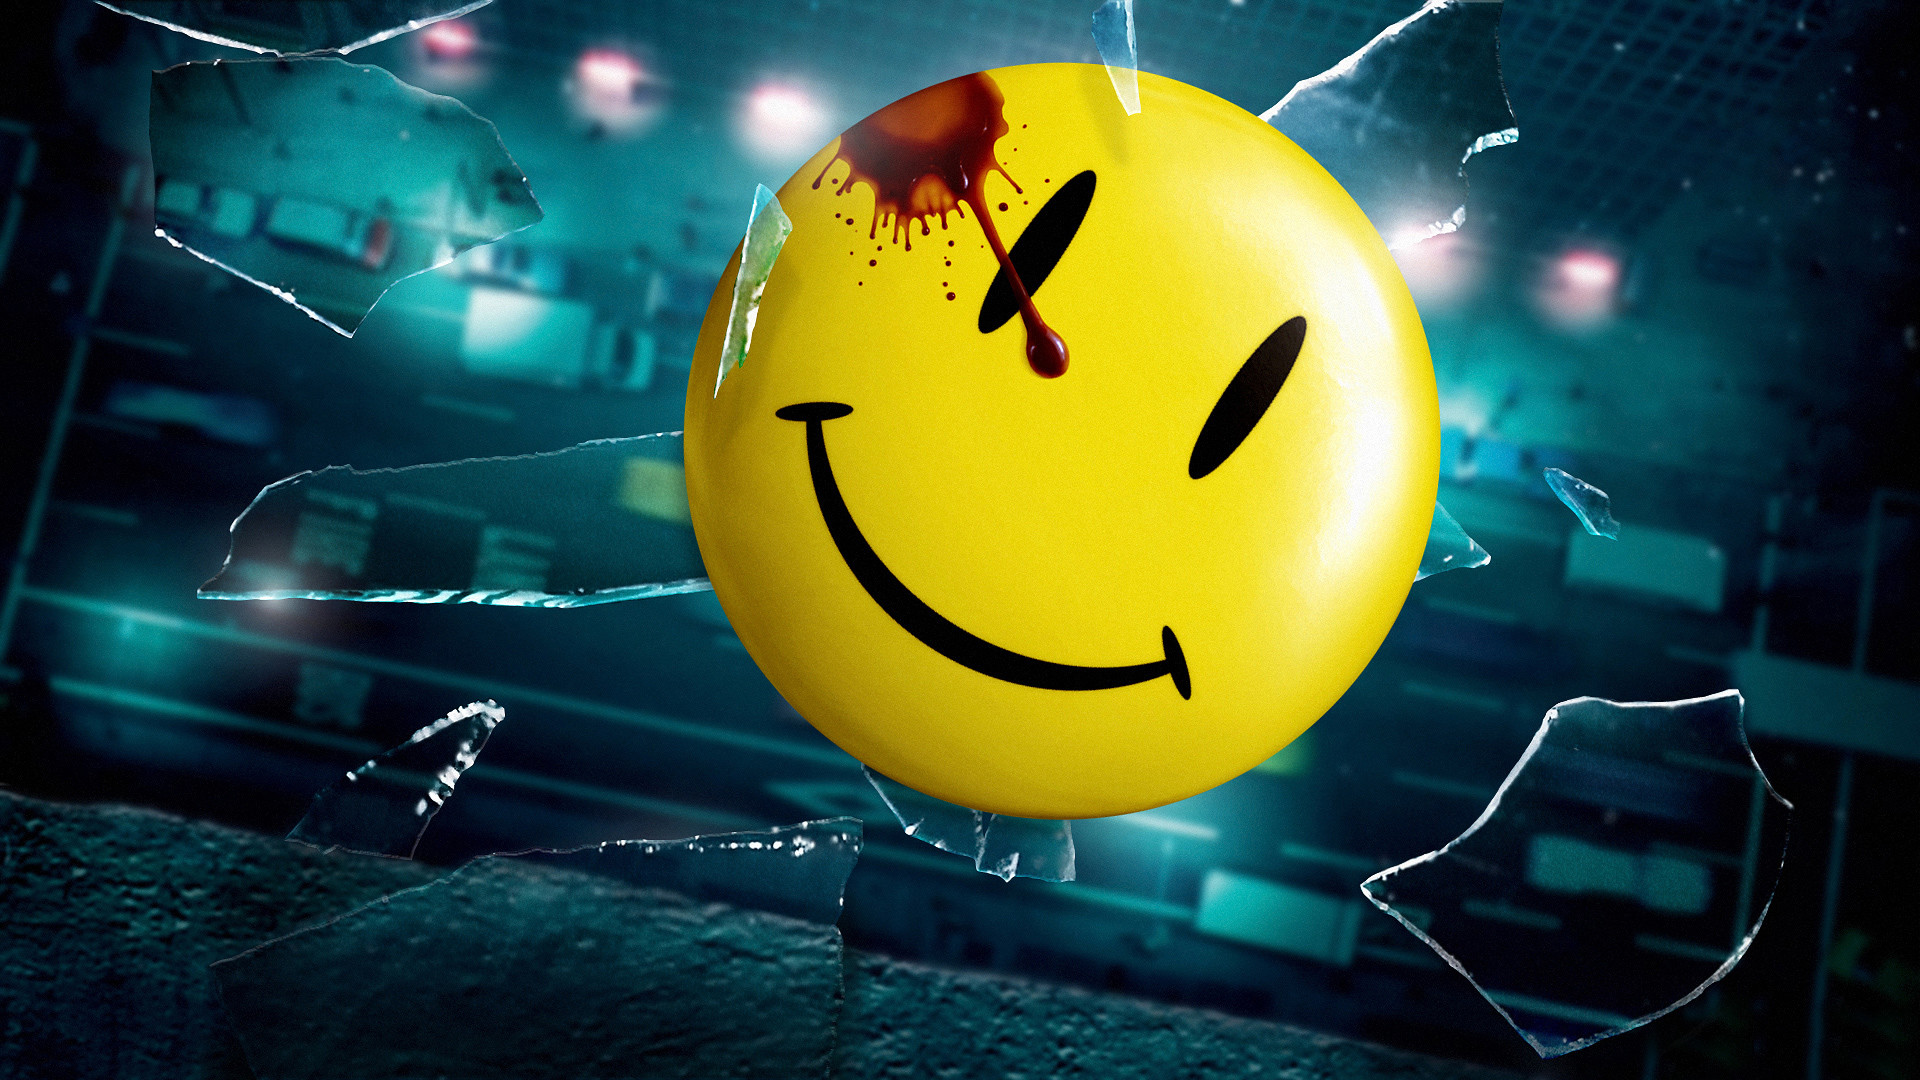 Hd Wallpapers | Watchmen Smiley HD Wallpaper #2080 Wallpaper |  Wall-Height.com